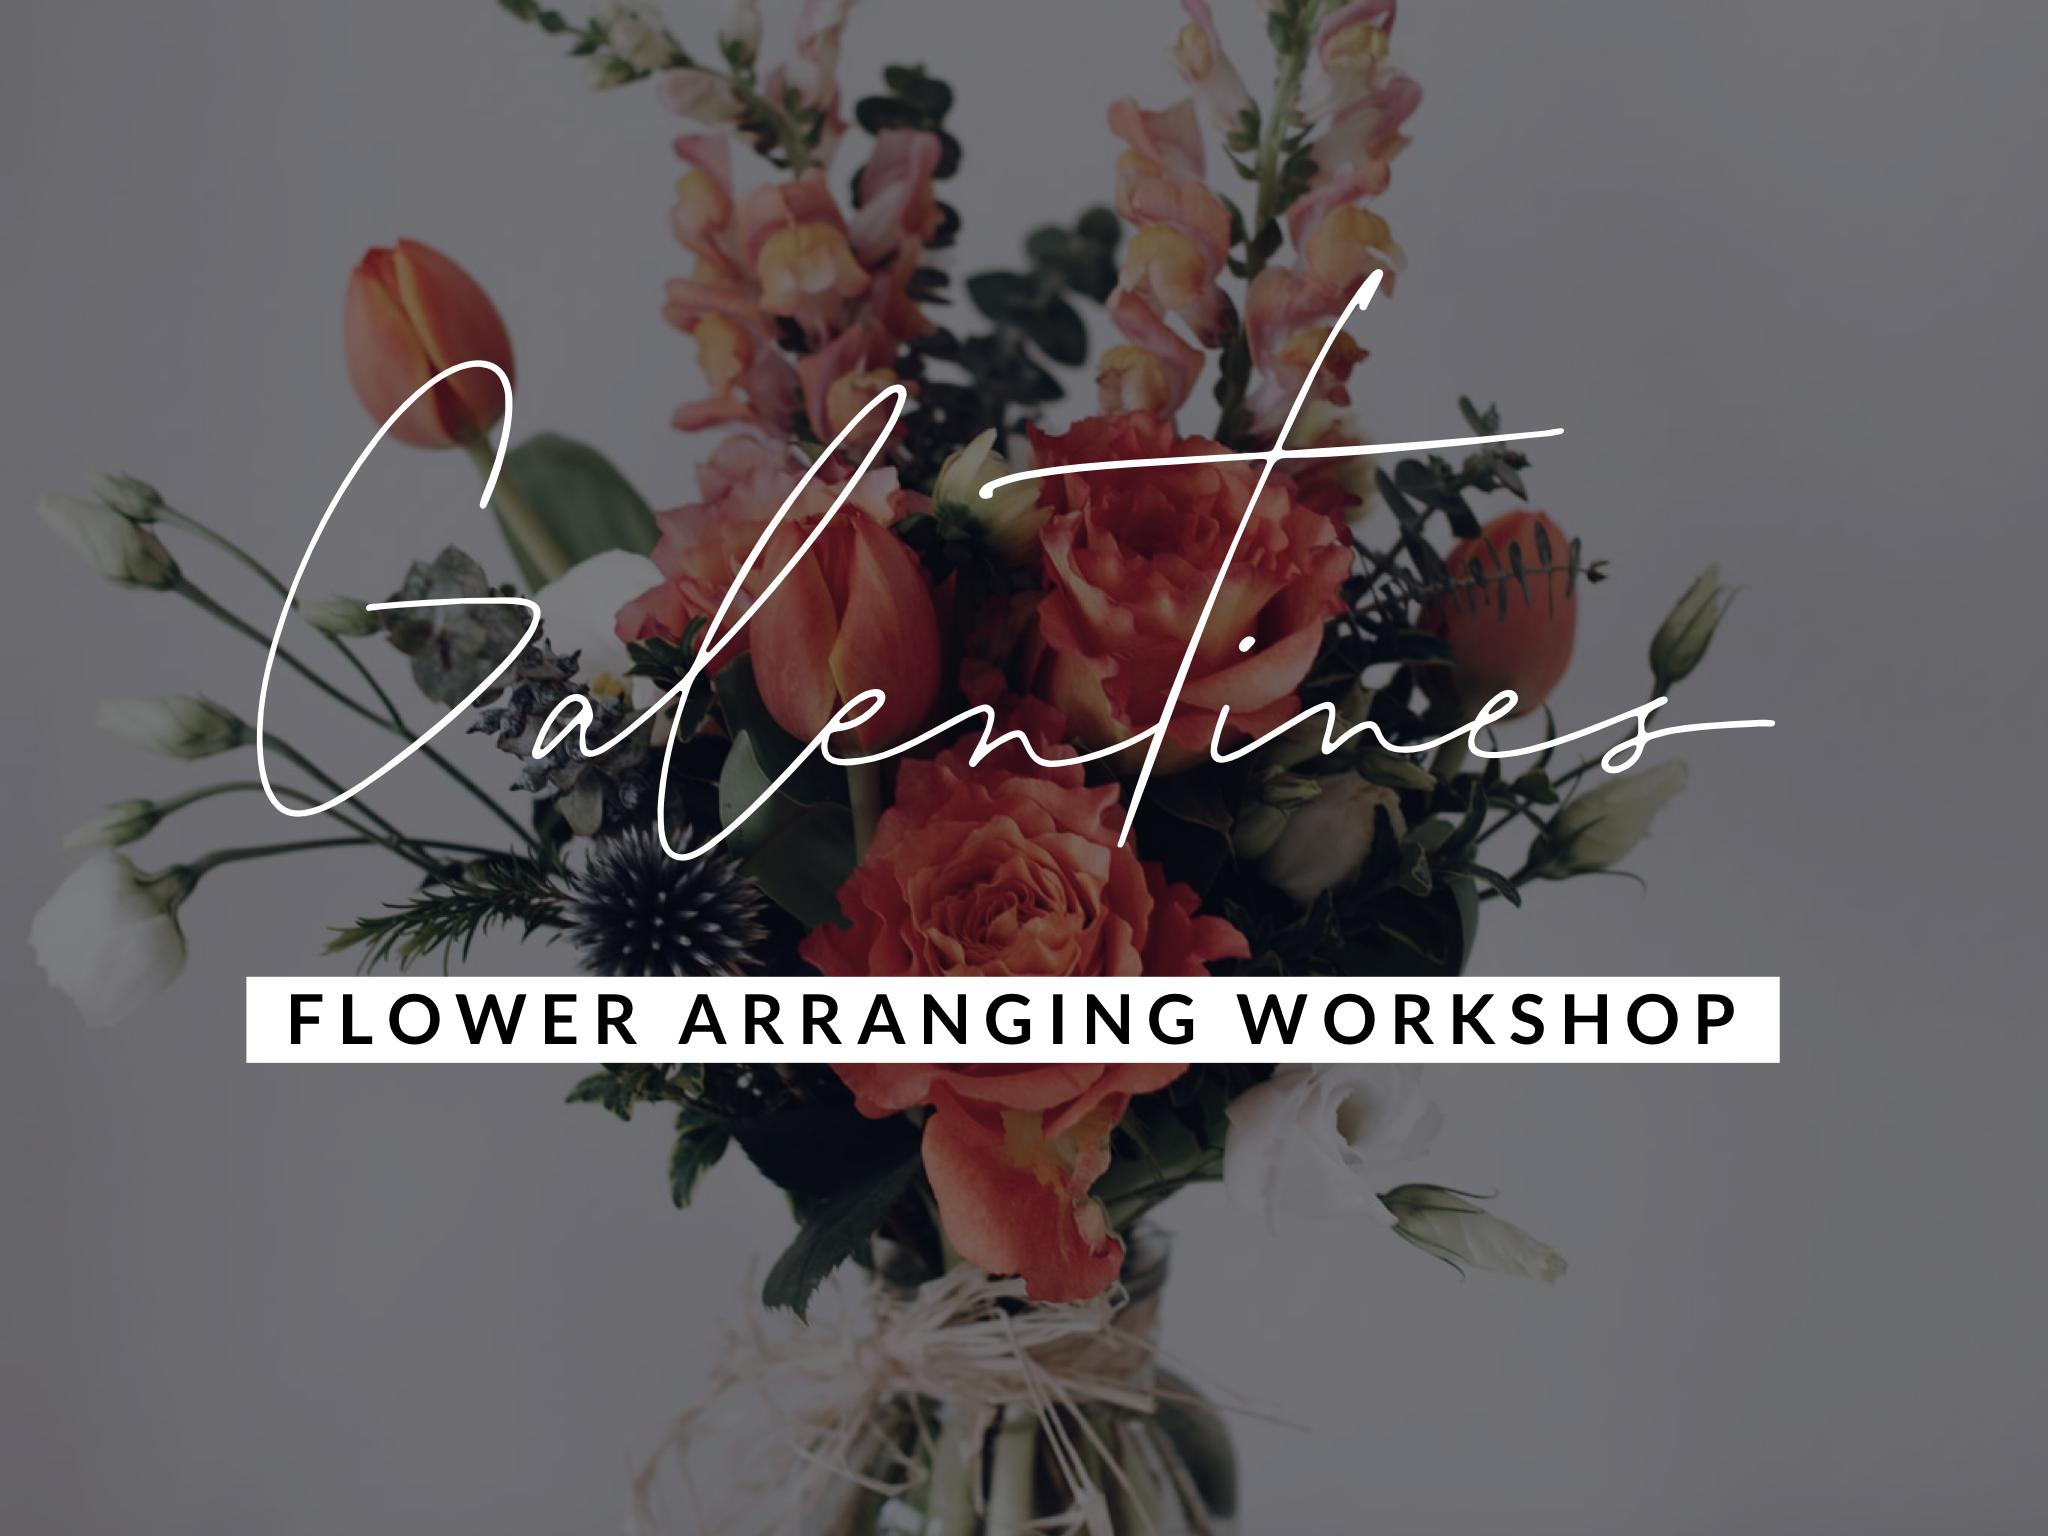 Galentines Flower Arranging Workshop